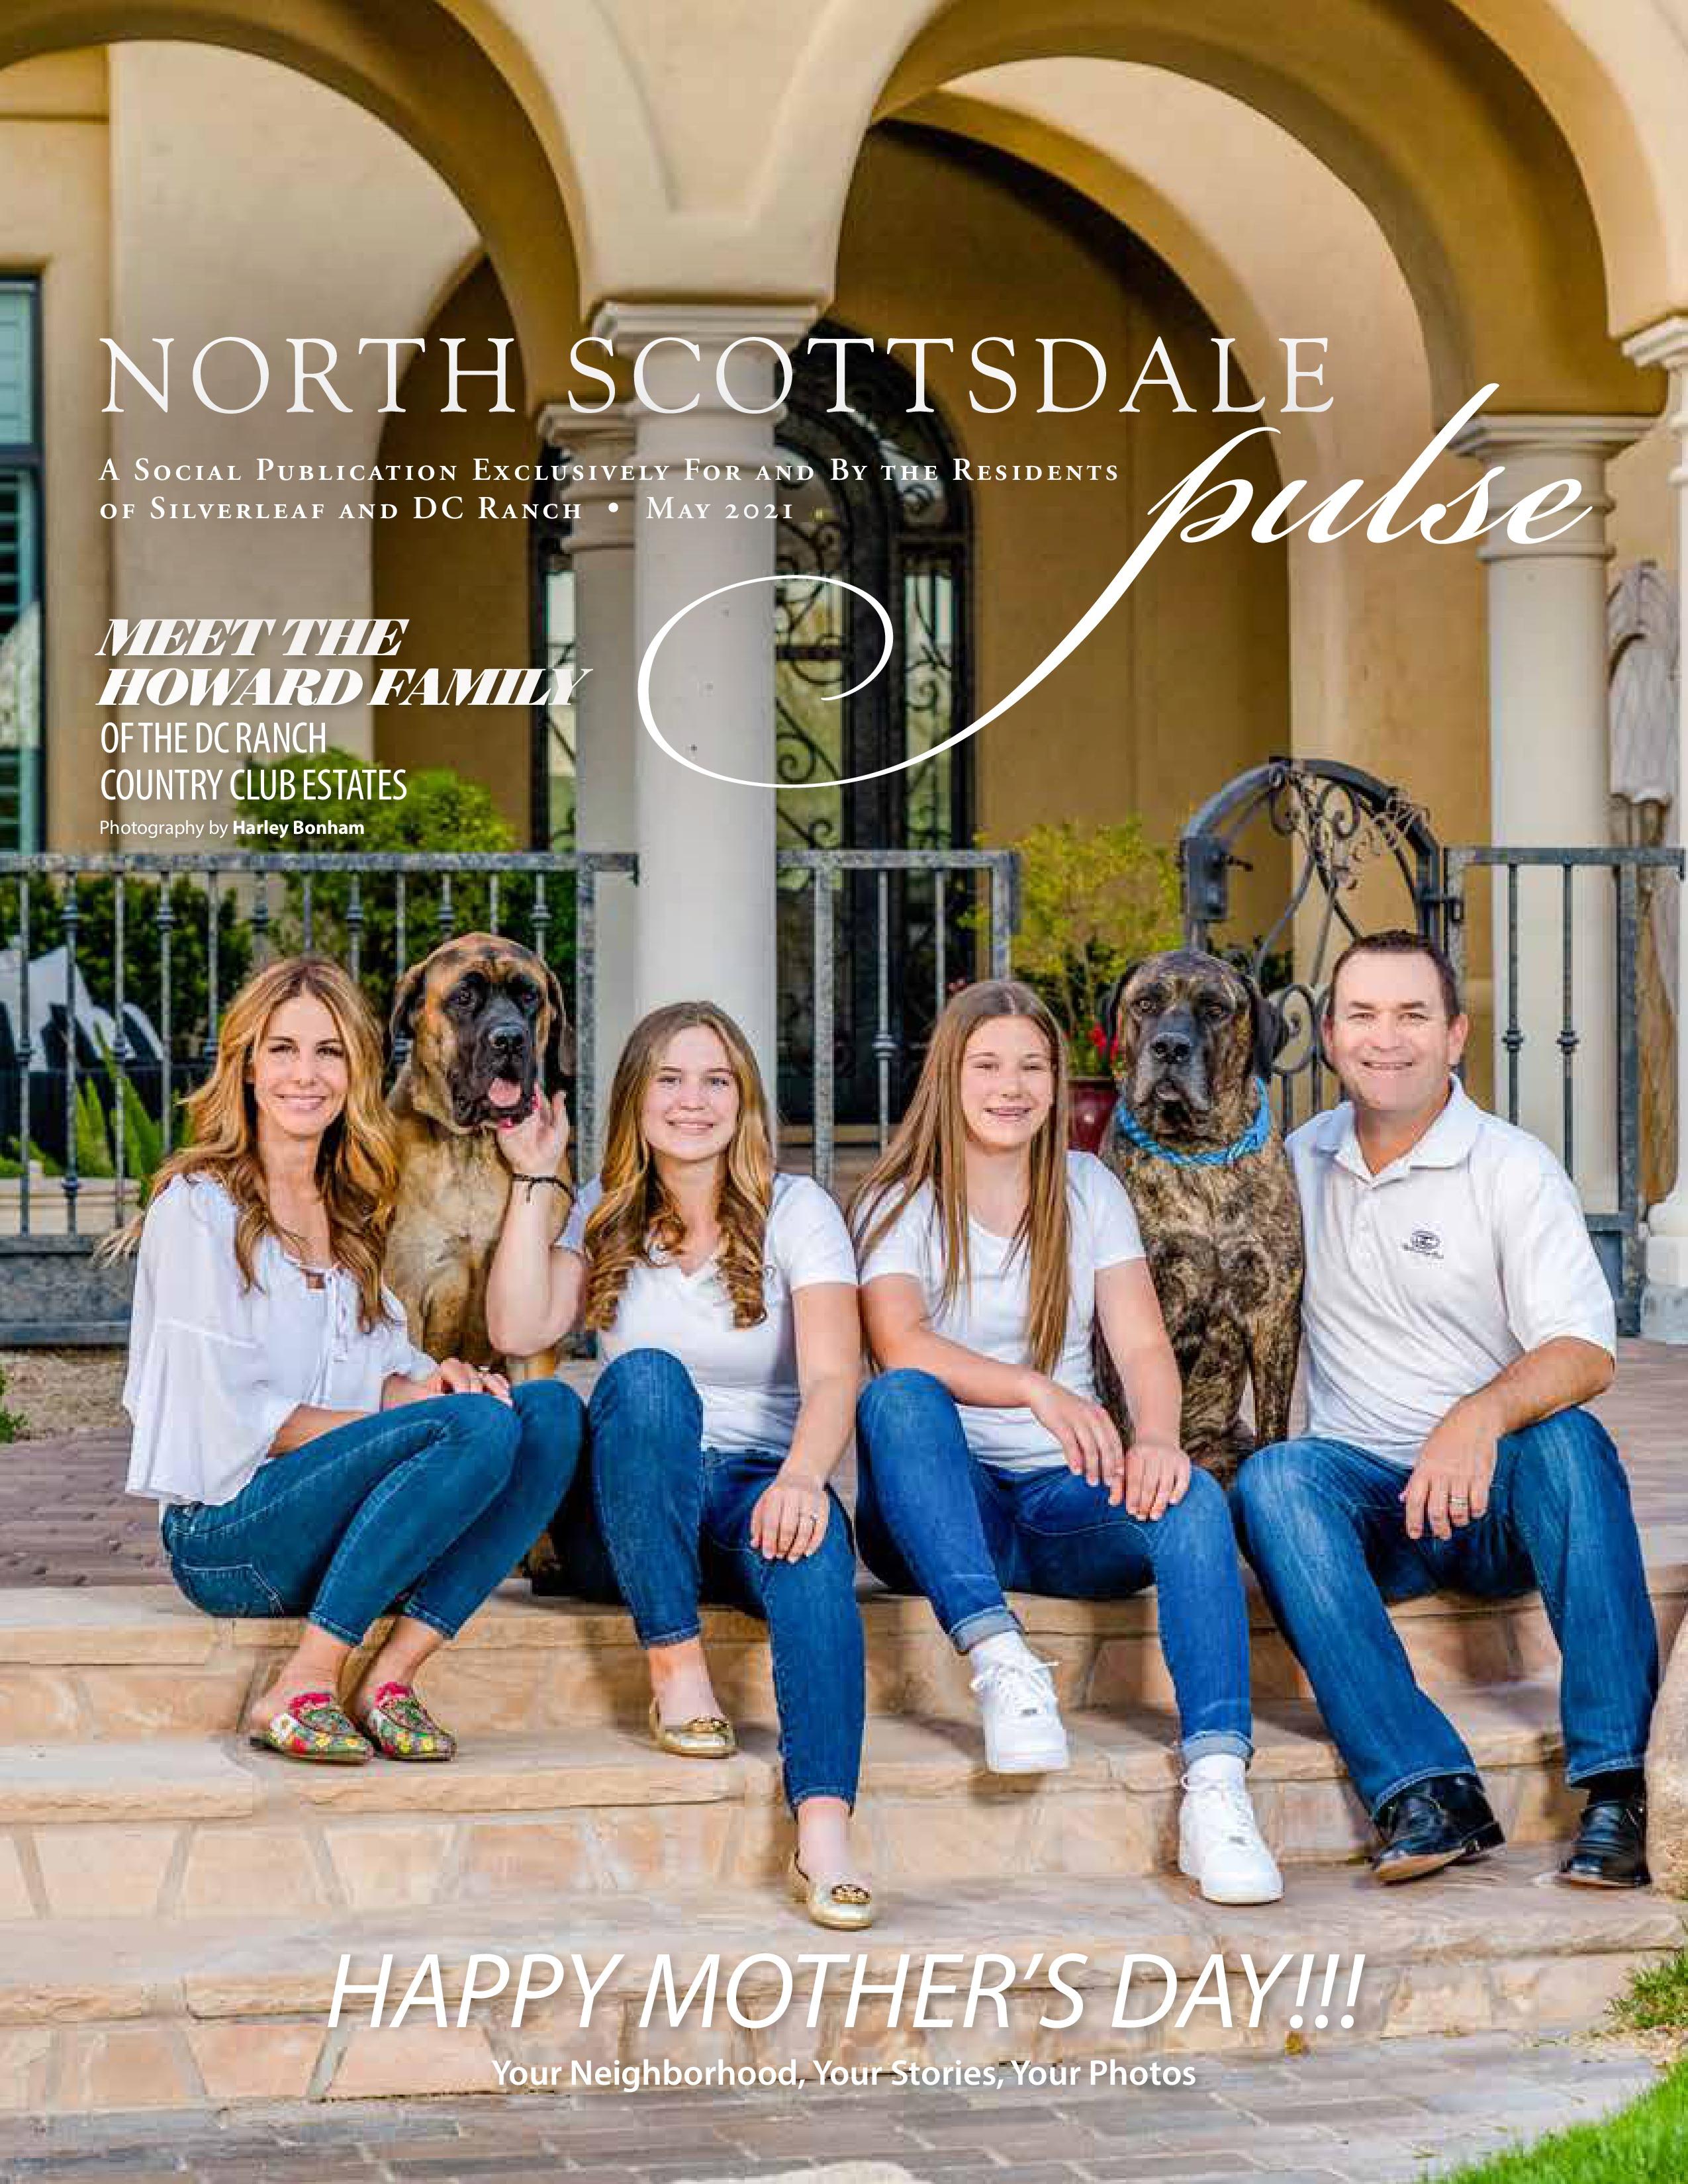 North Scottsdale Pulse 2021-05-01